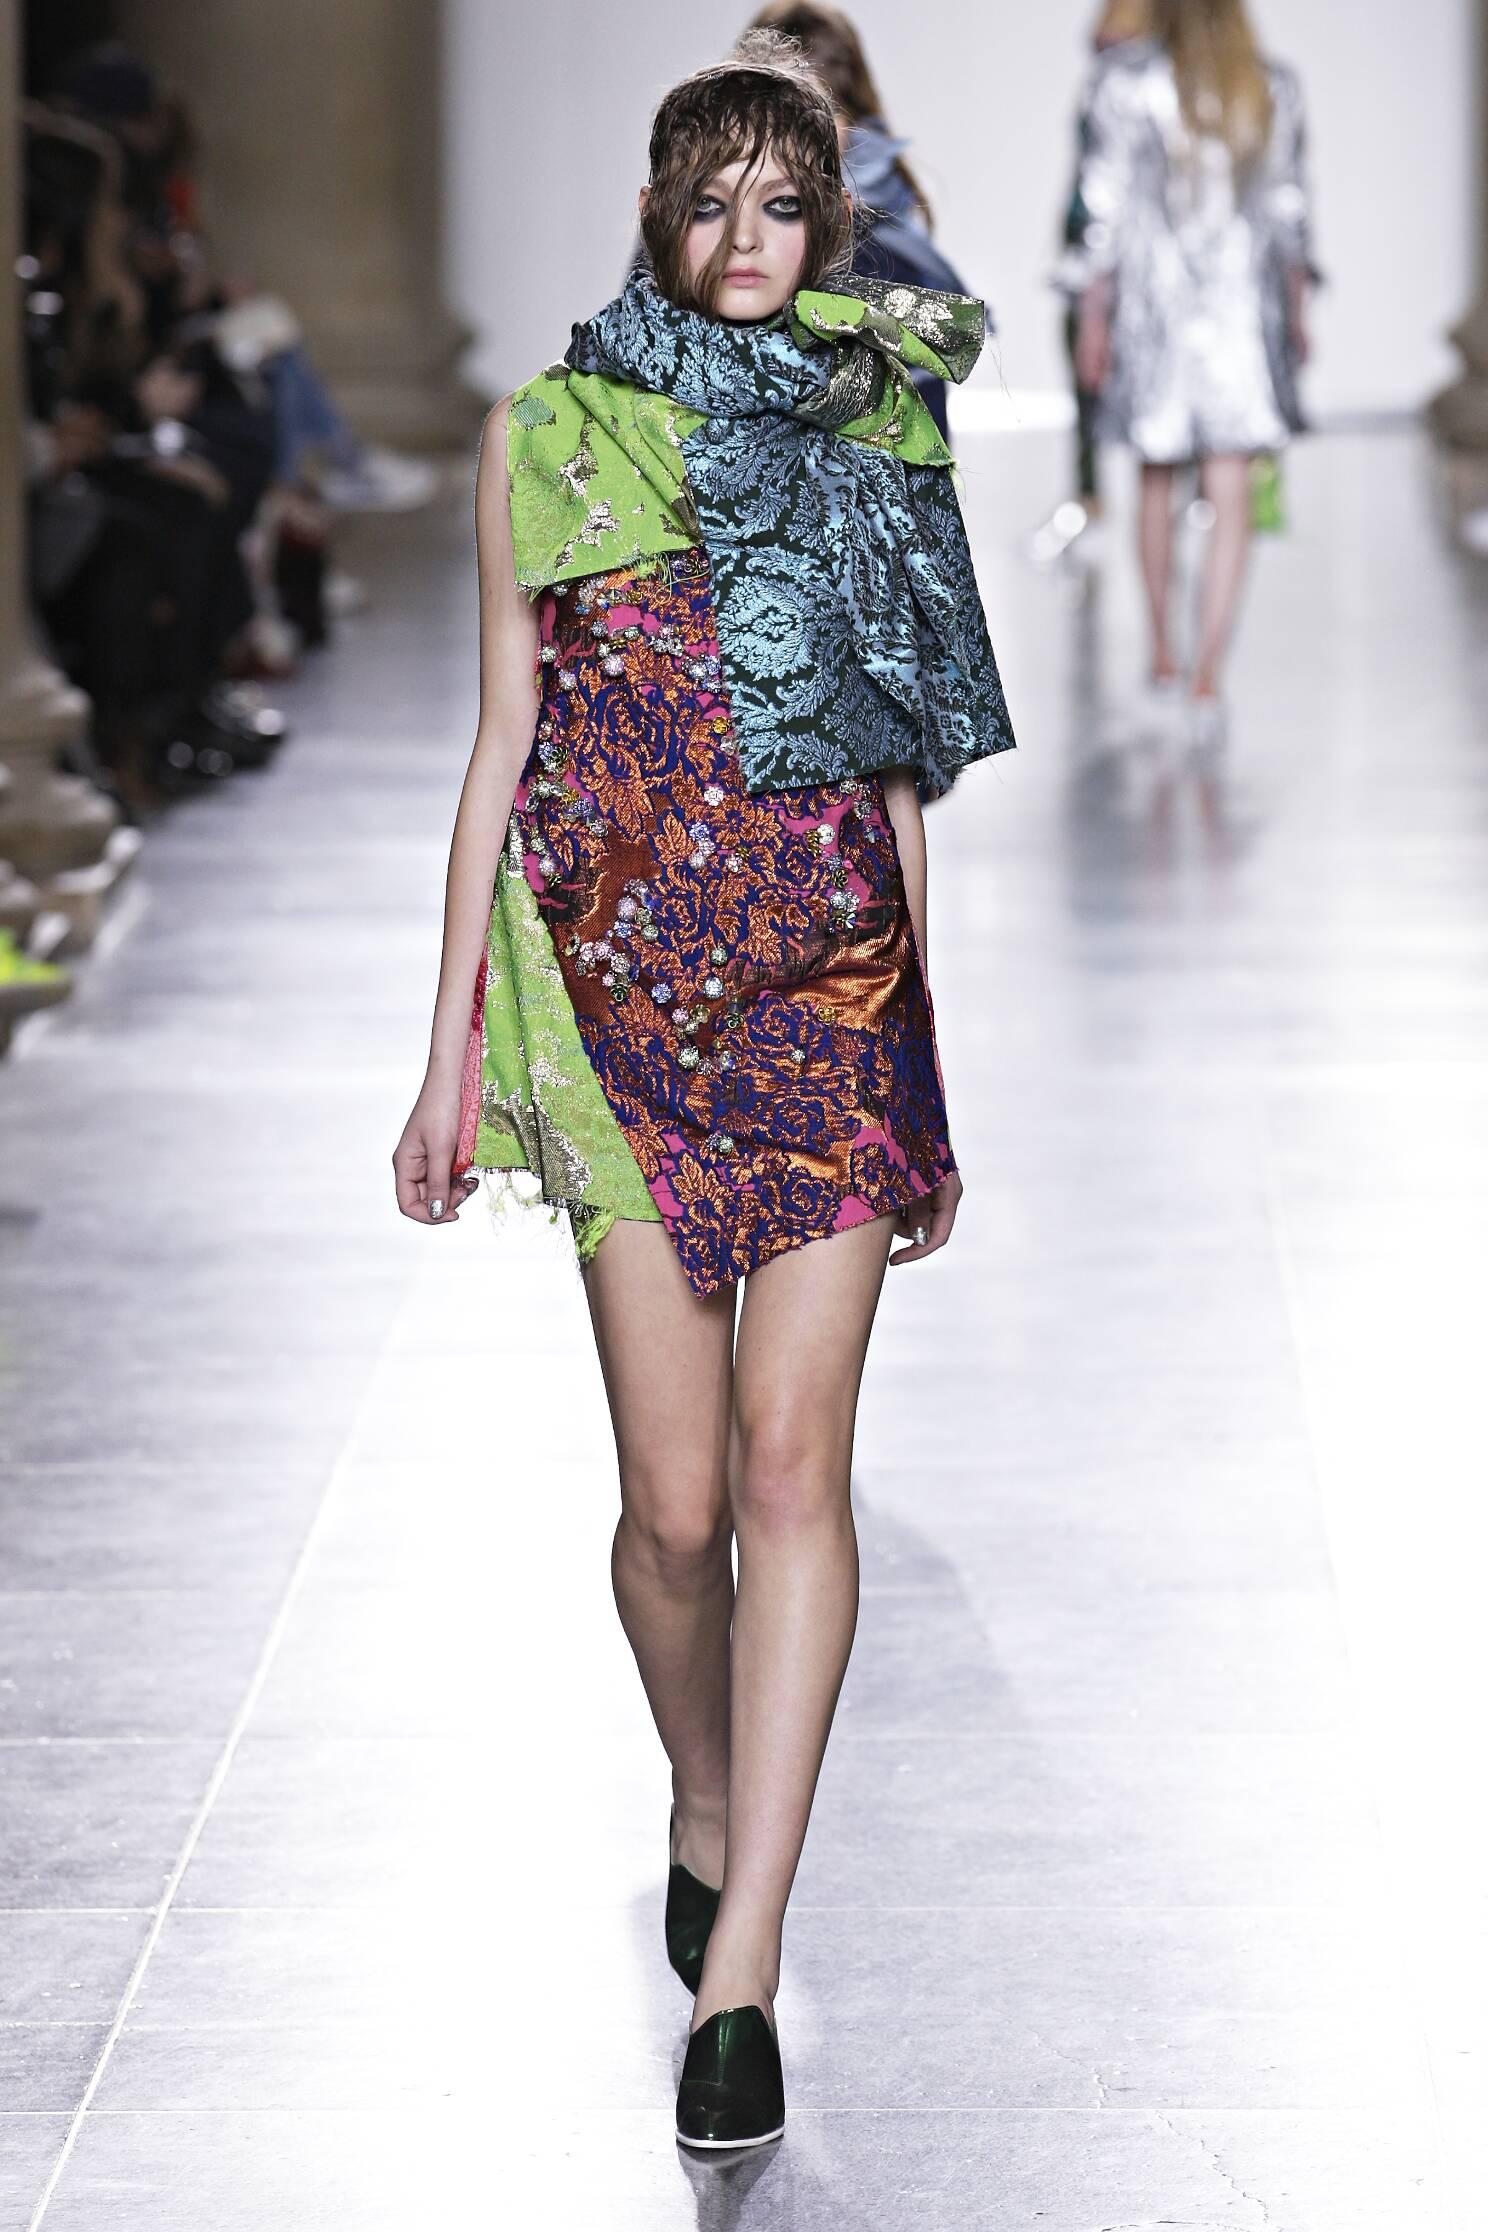 Winter 2015 Fashion Trends Marques Almeida Collection